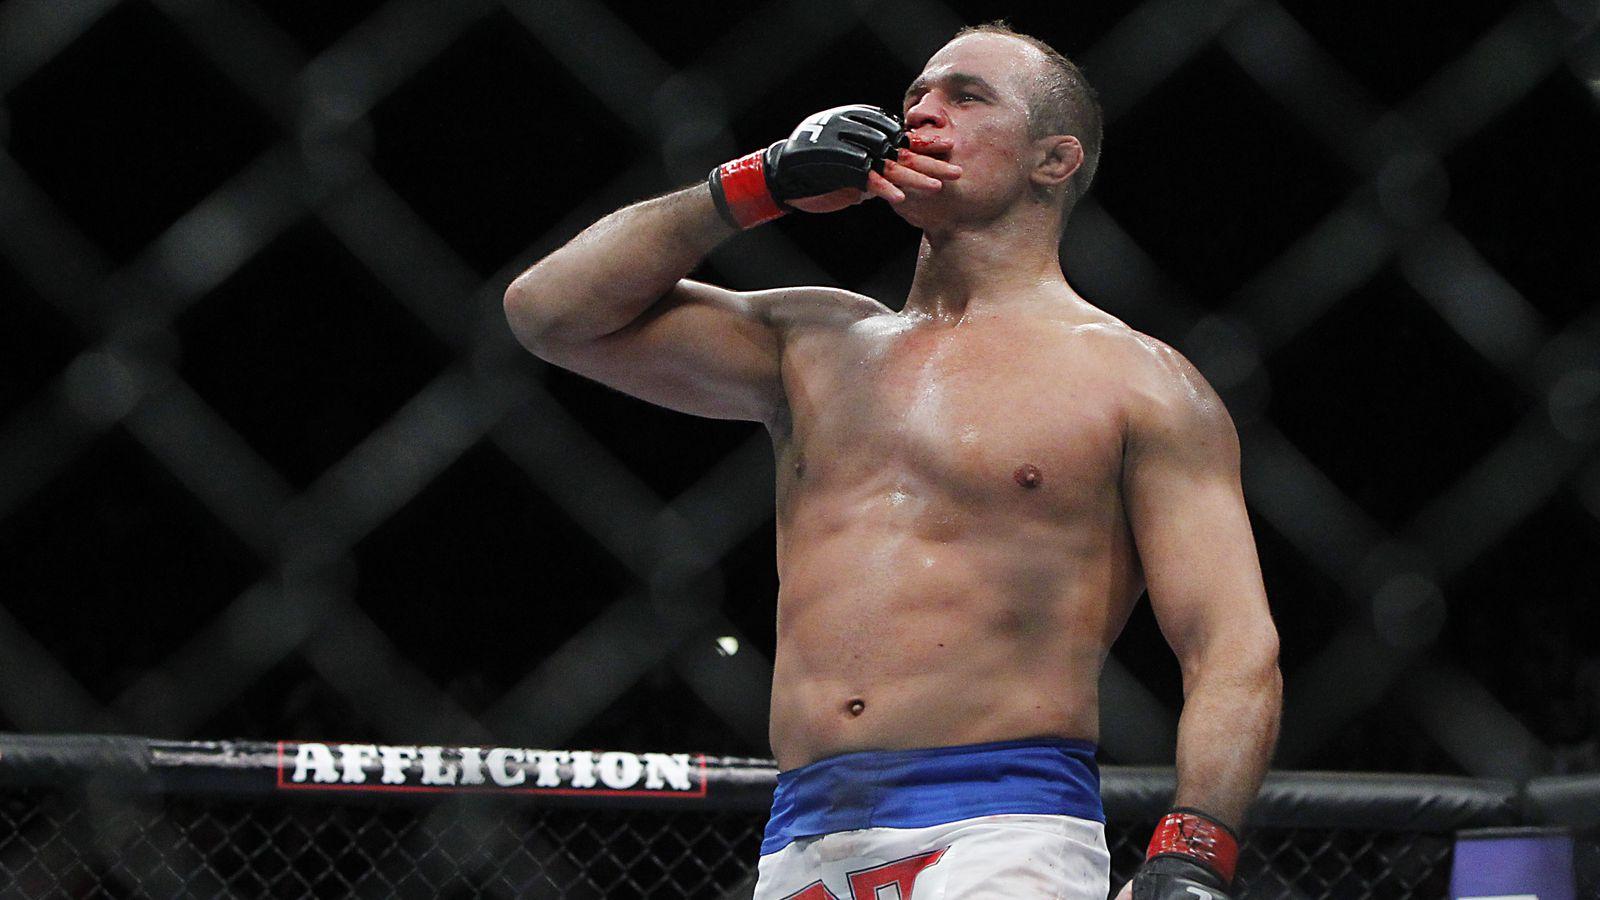 UFC on Fox 13: Dos Santos vs. Miocic weigh-in results: dos Santos 242, Miocic 243, Diaz badly misses weight